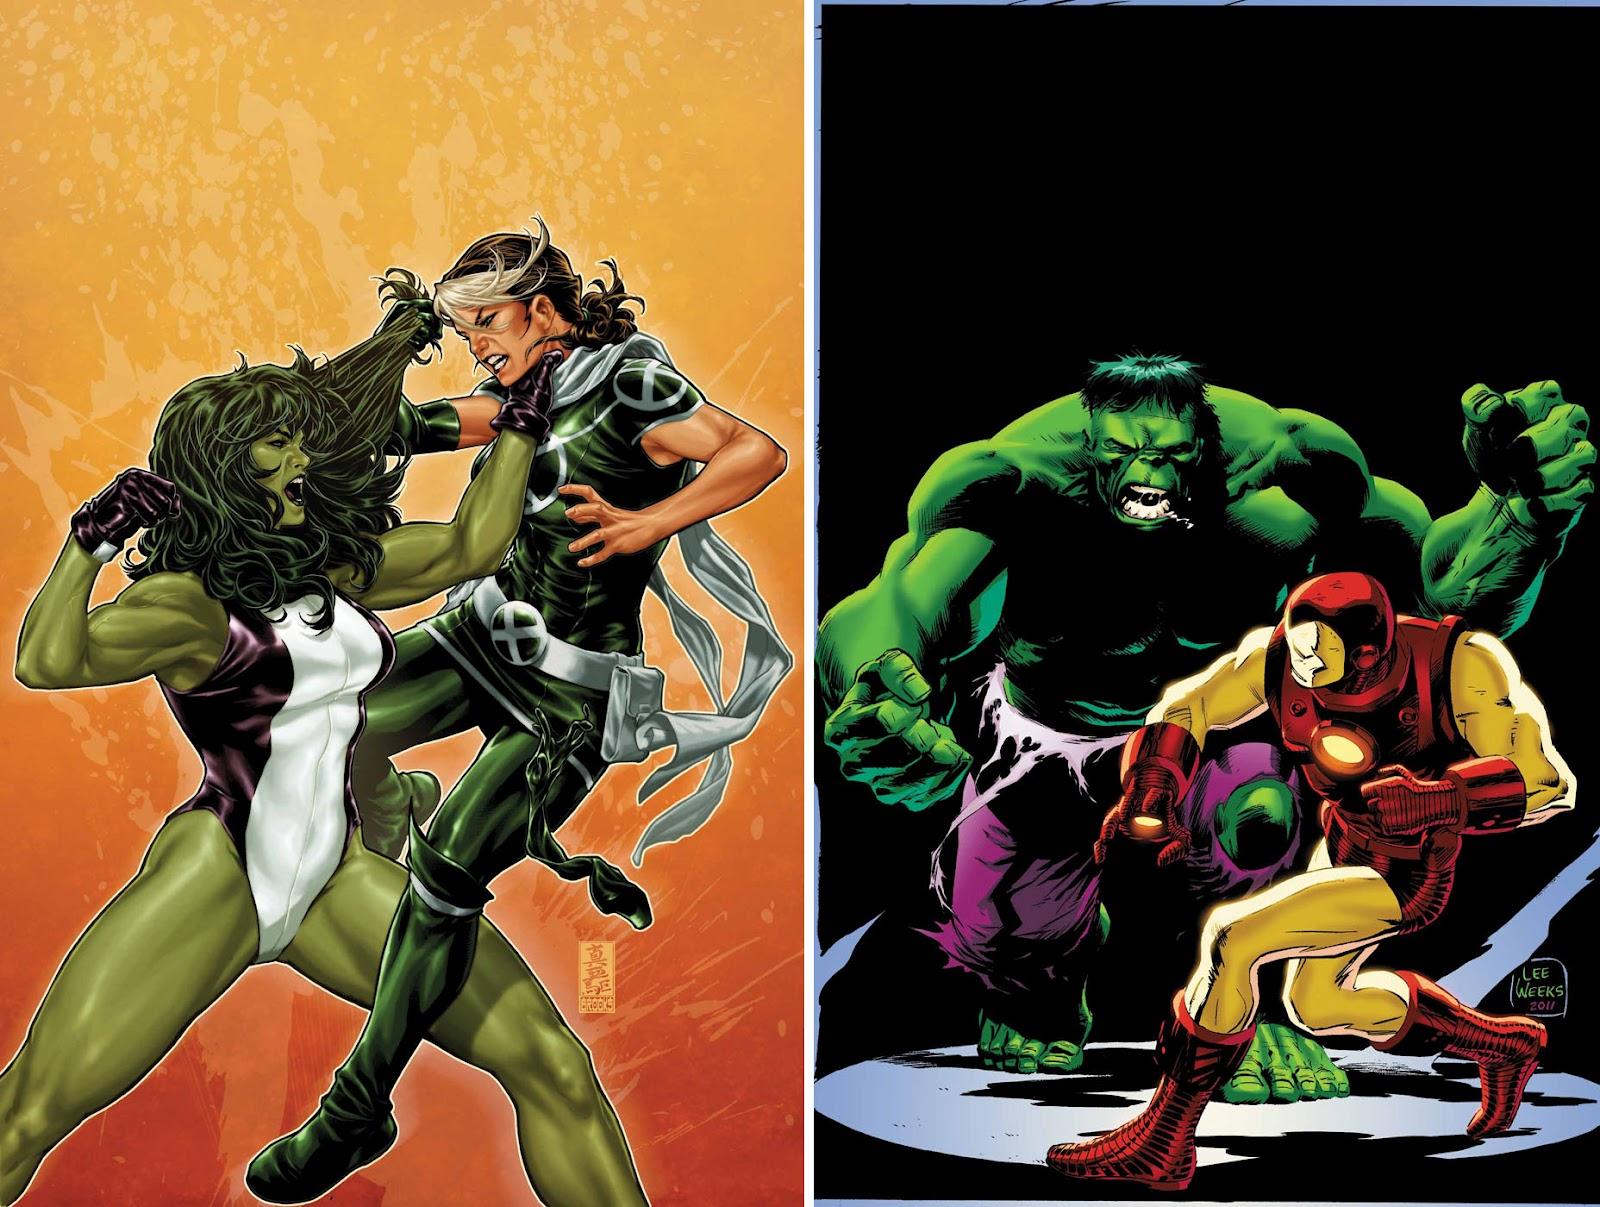 She Hulk Transformation Real Life Mark brooks she-hulk is on